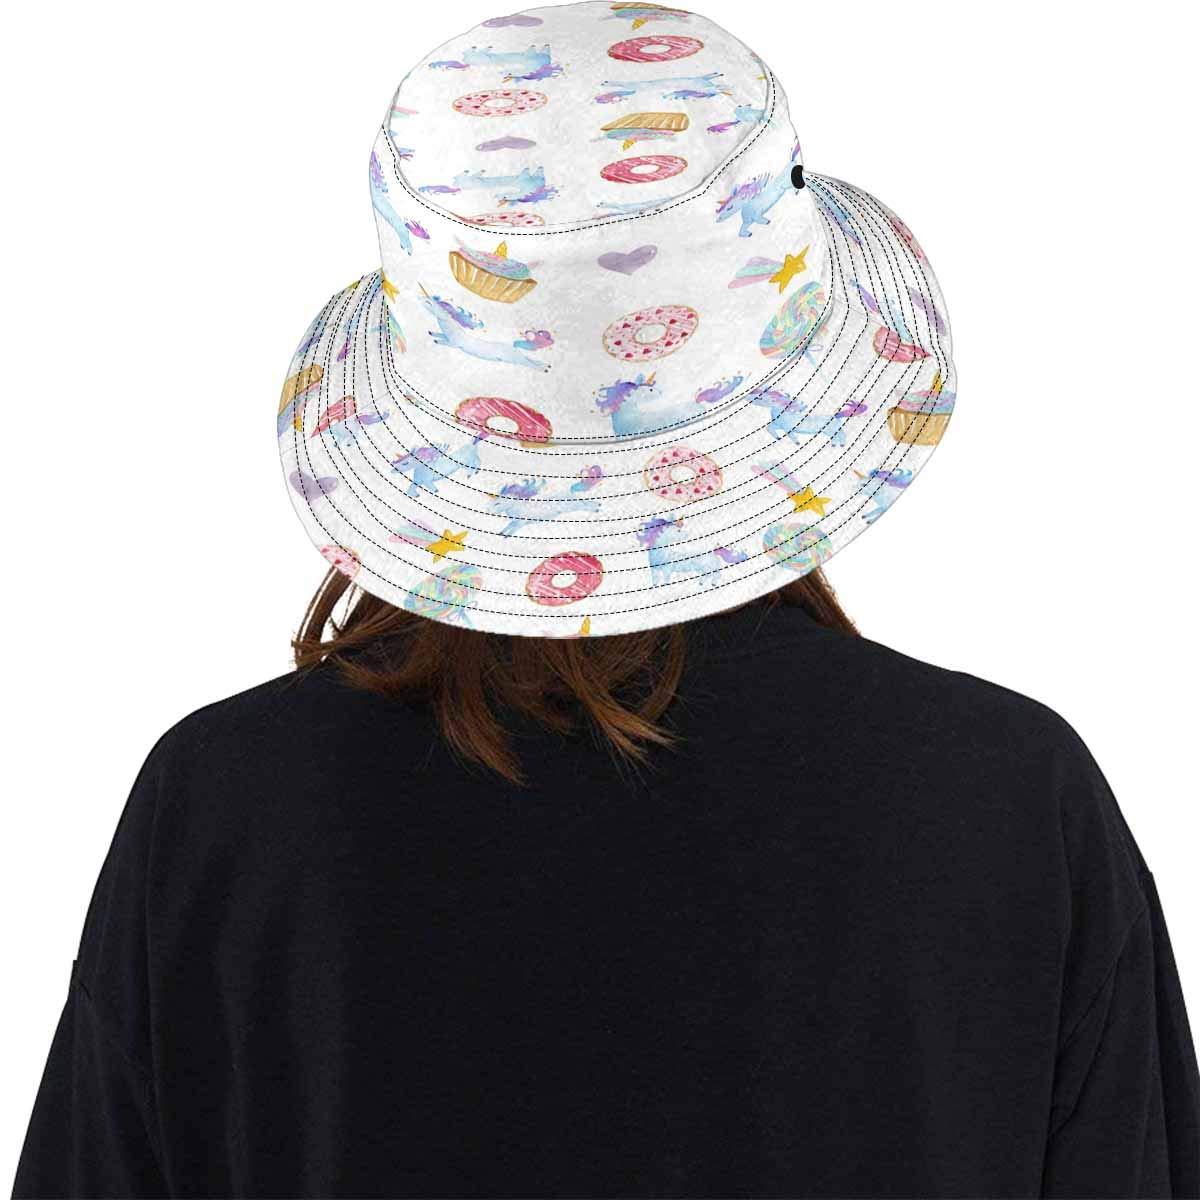 INTERESTPRINT Unisex Bucket Hats